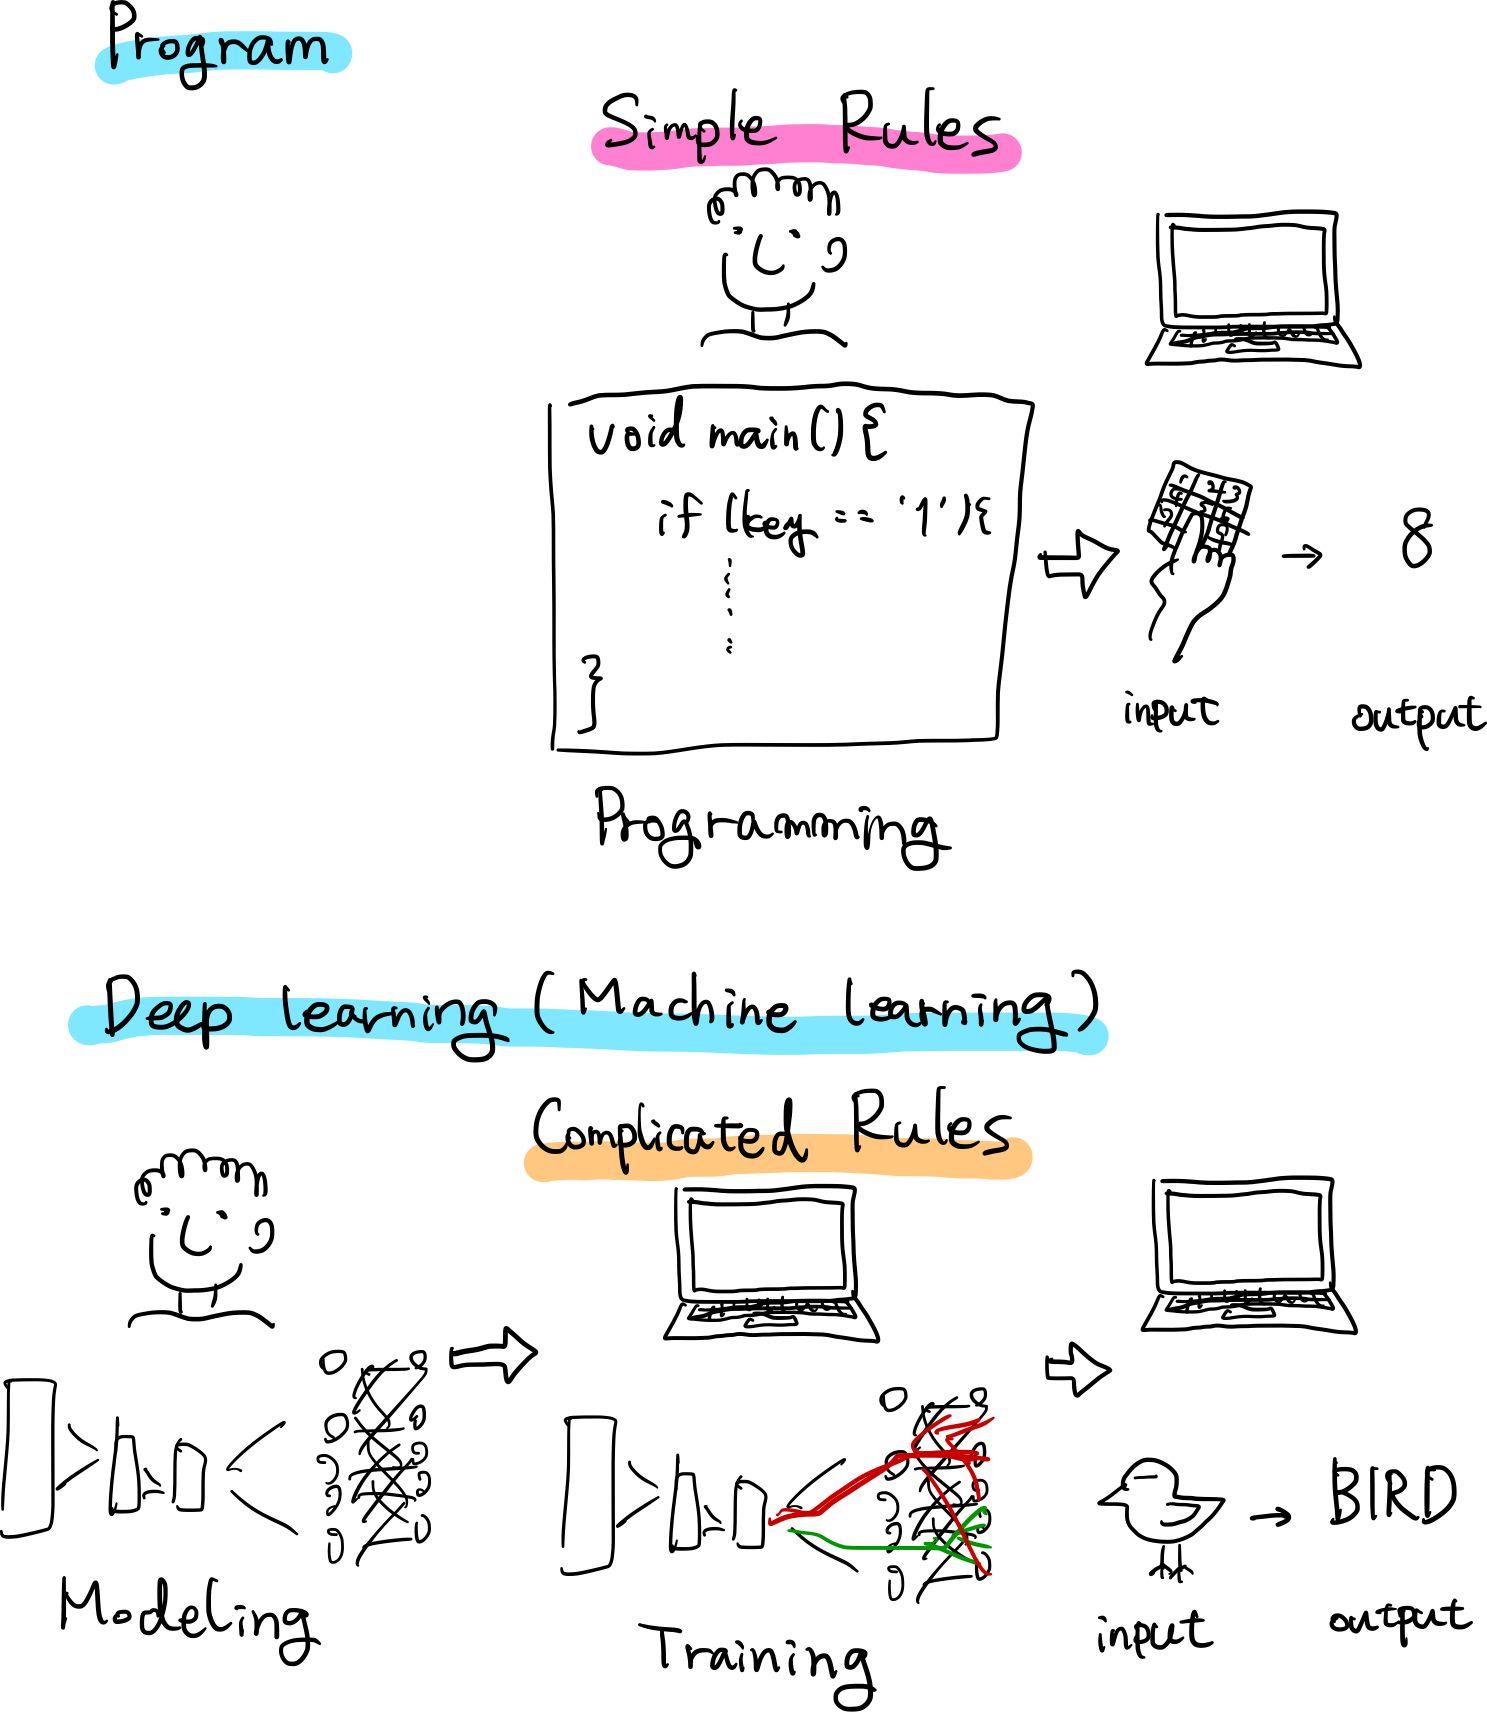 Program vs DeepLearning